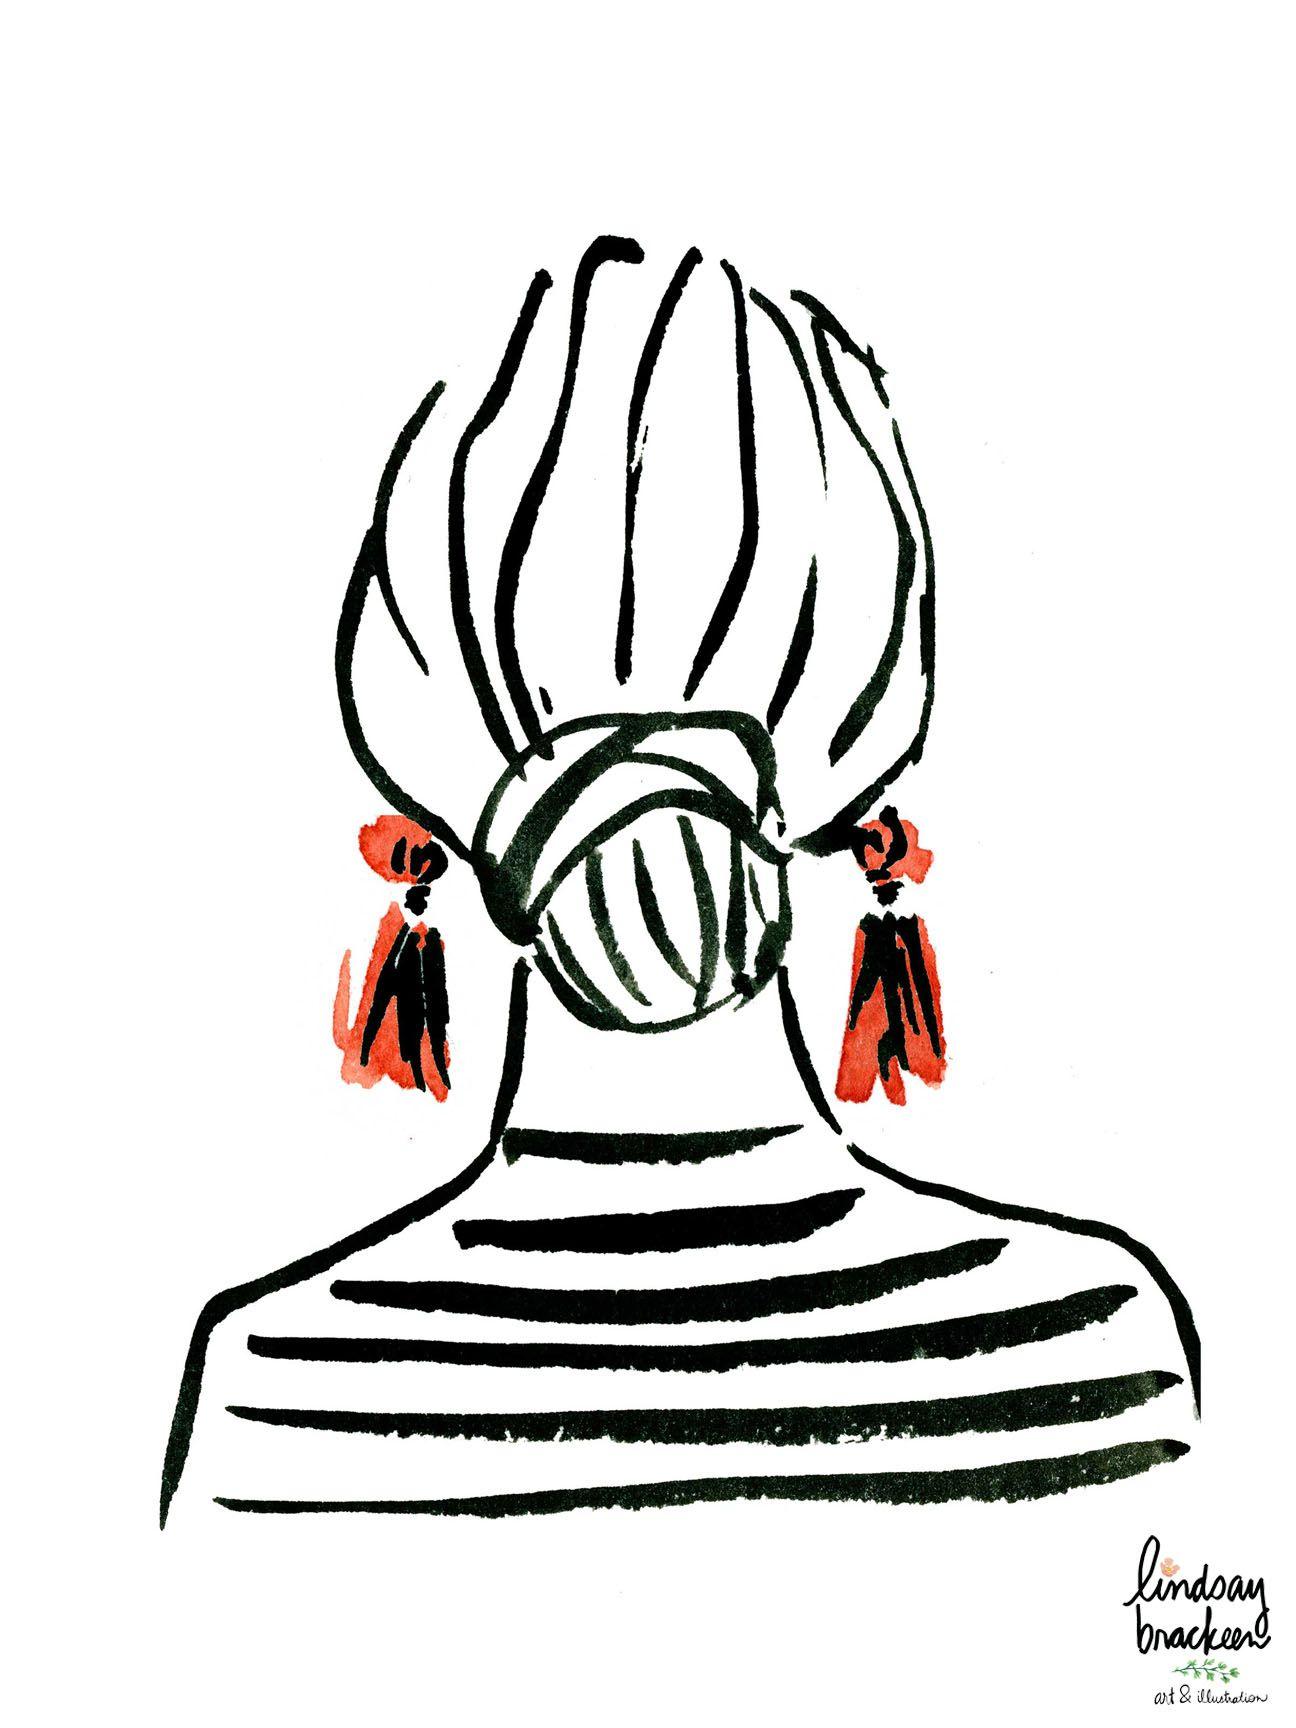 Hairstyle Bun Illustration by Lindsay Brackeen